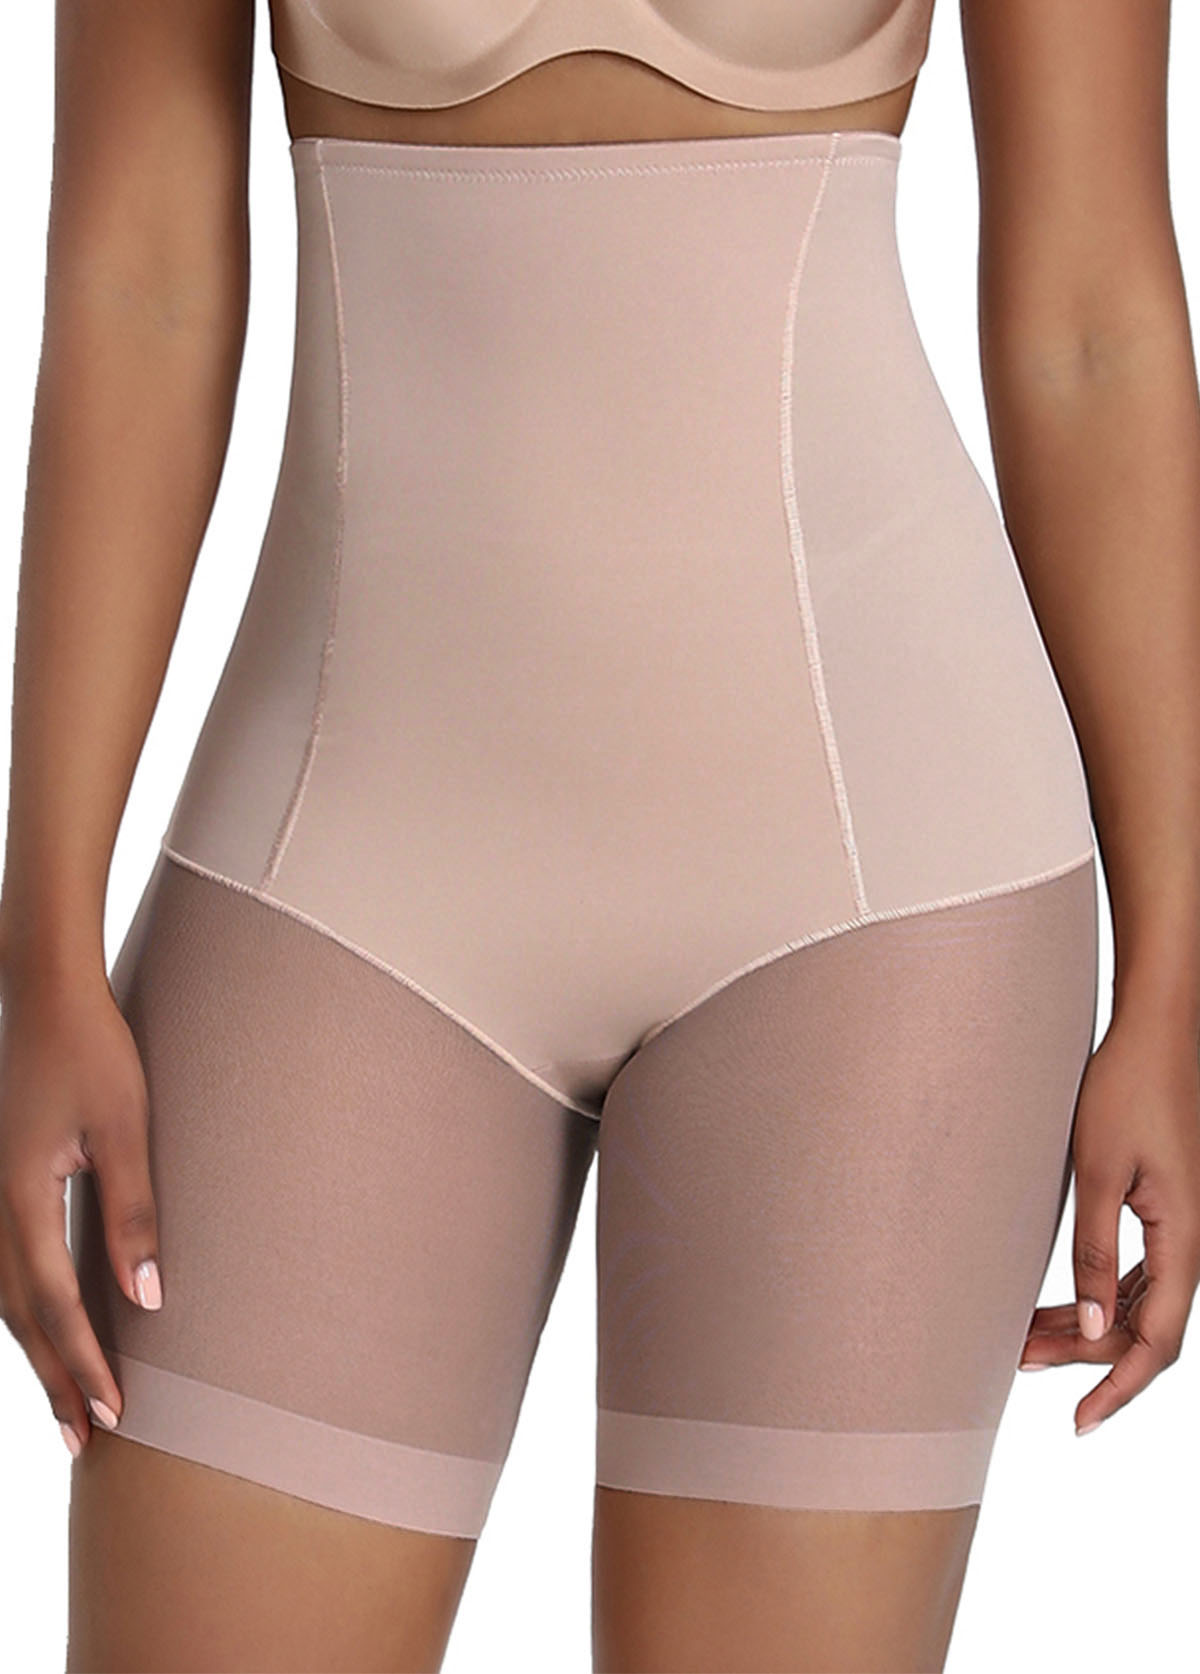 Light Khaki High Waisted Solid Panties